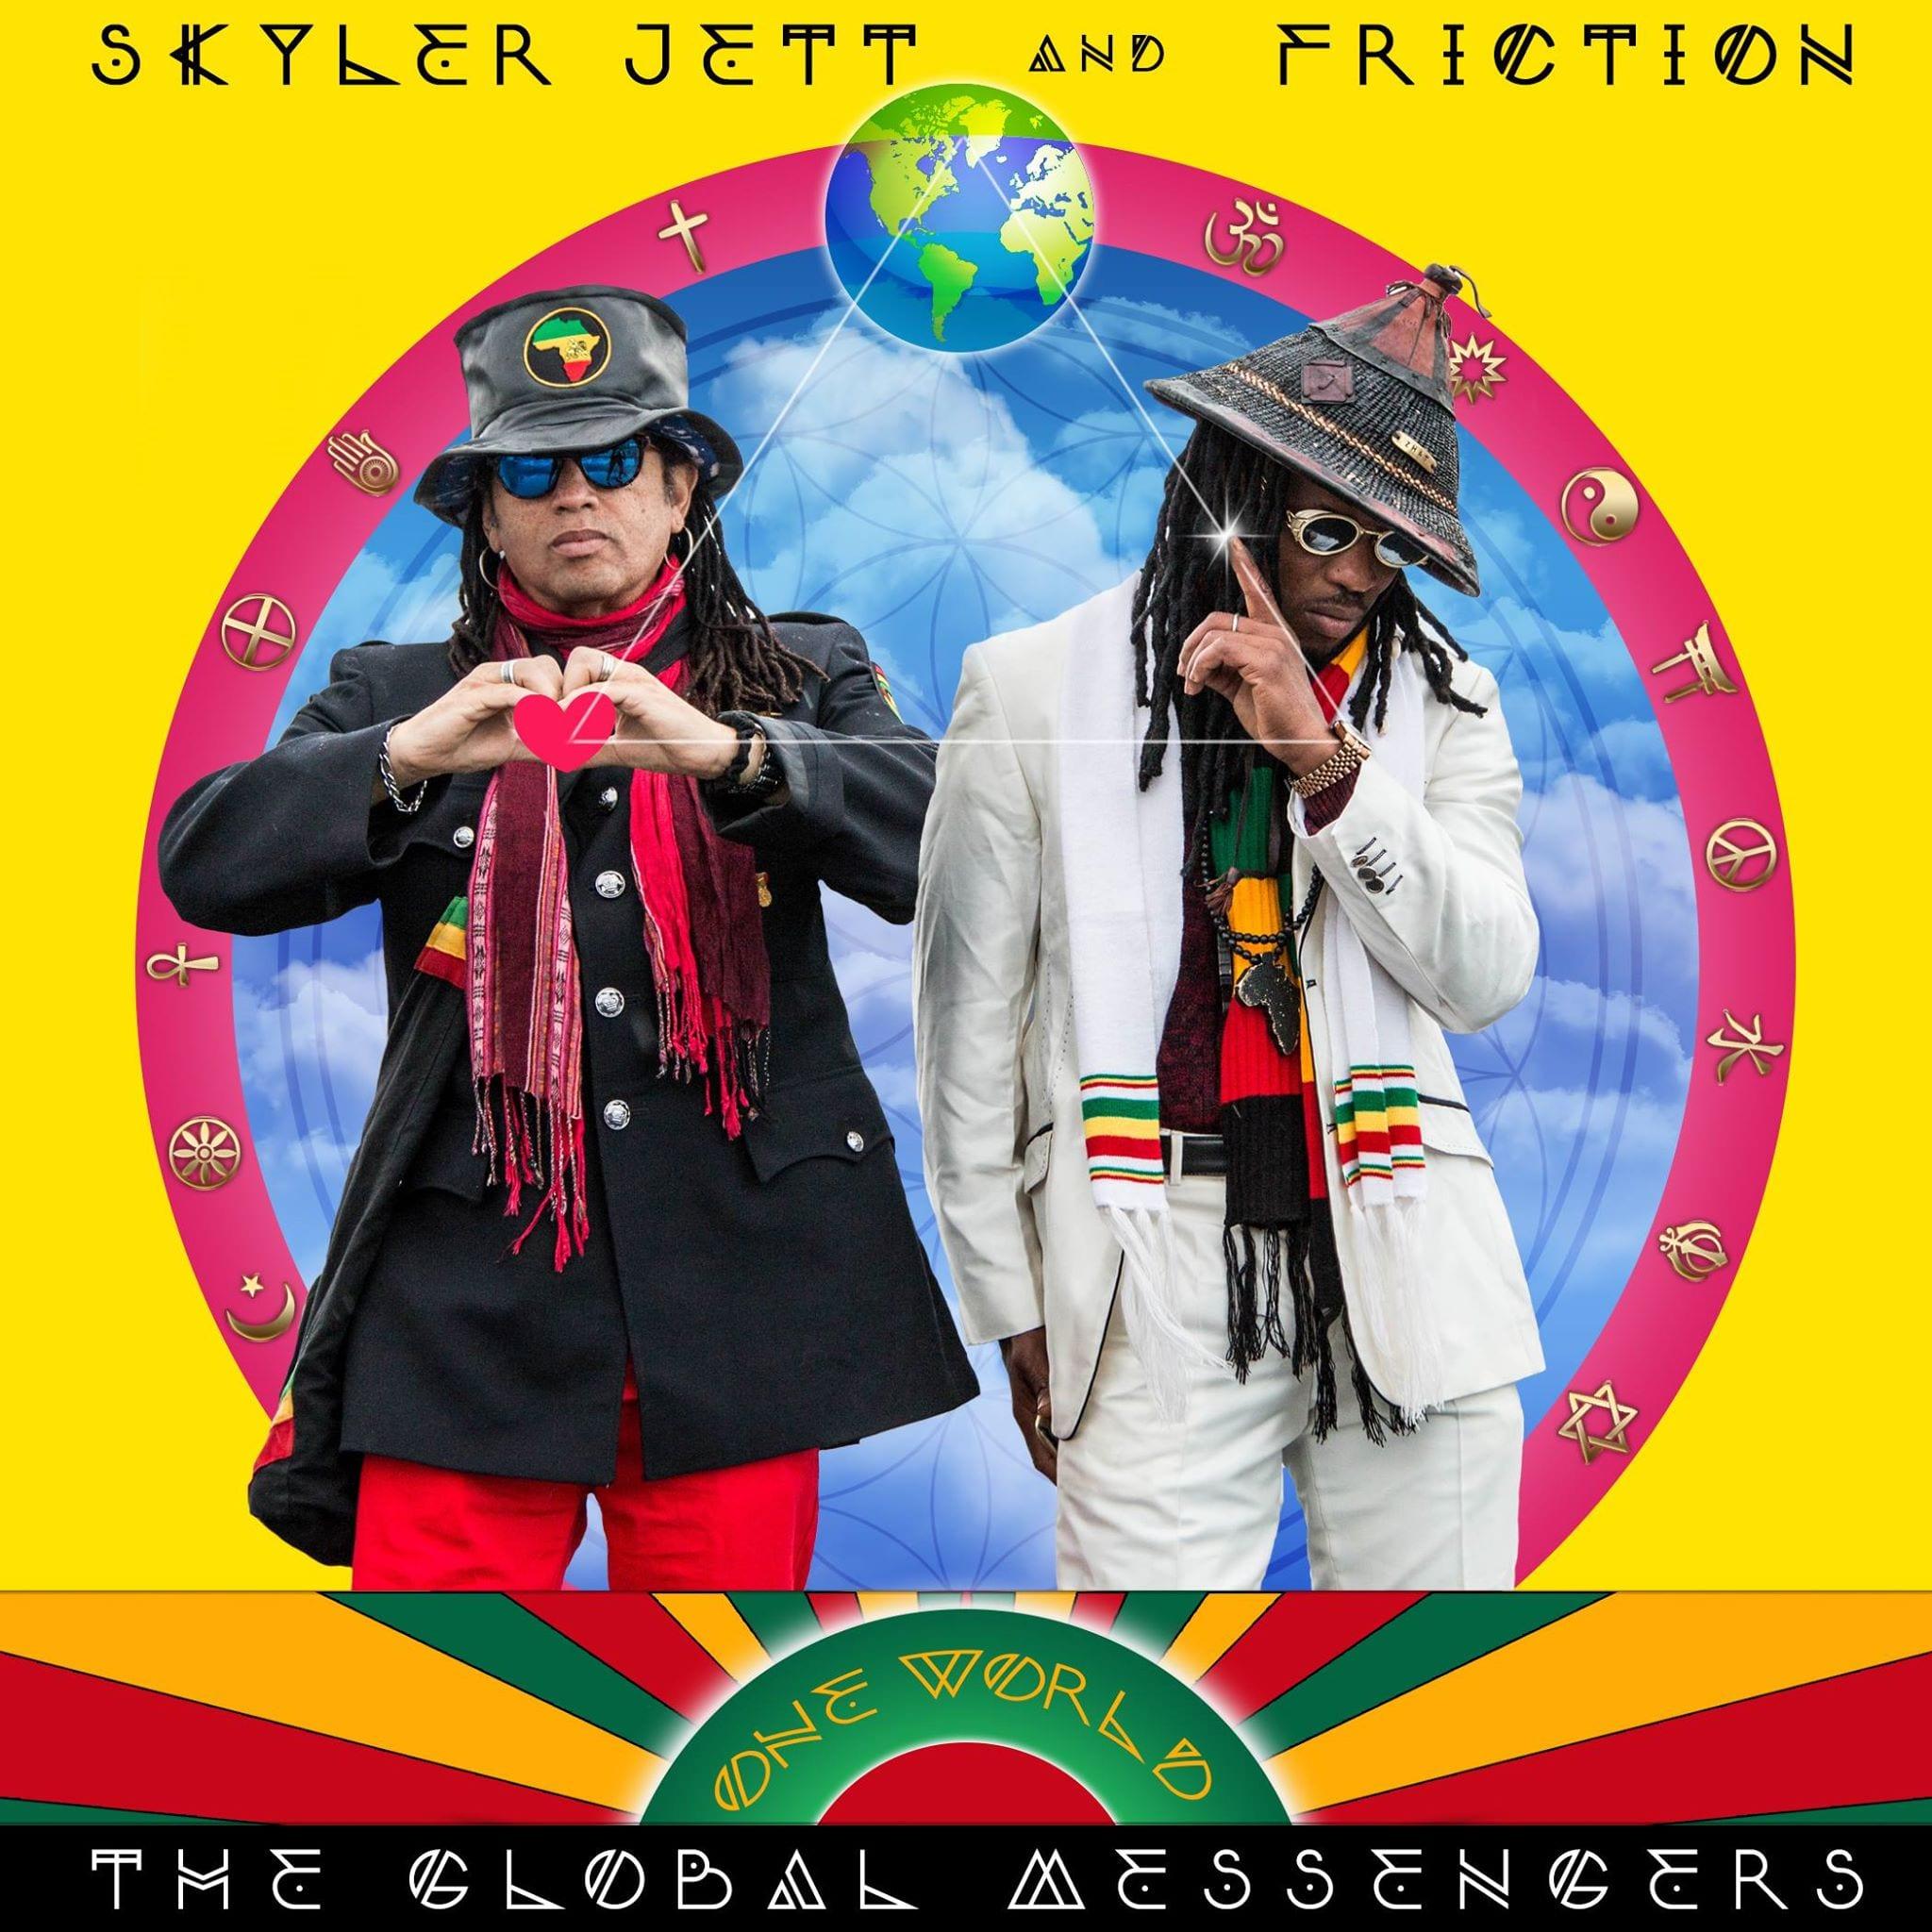 Skyler Jett & Friction - Edinburgh Recording Studio - Offbeat